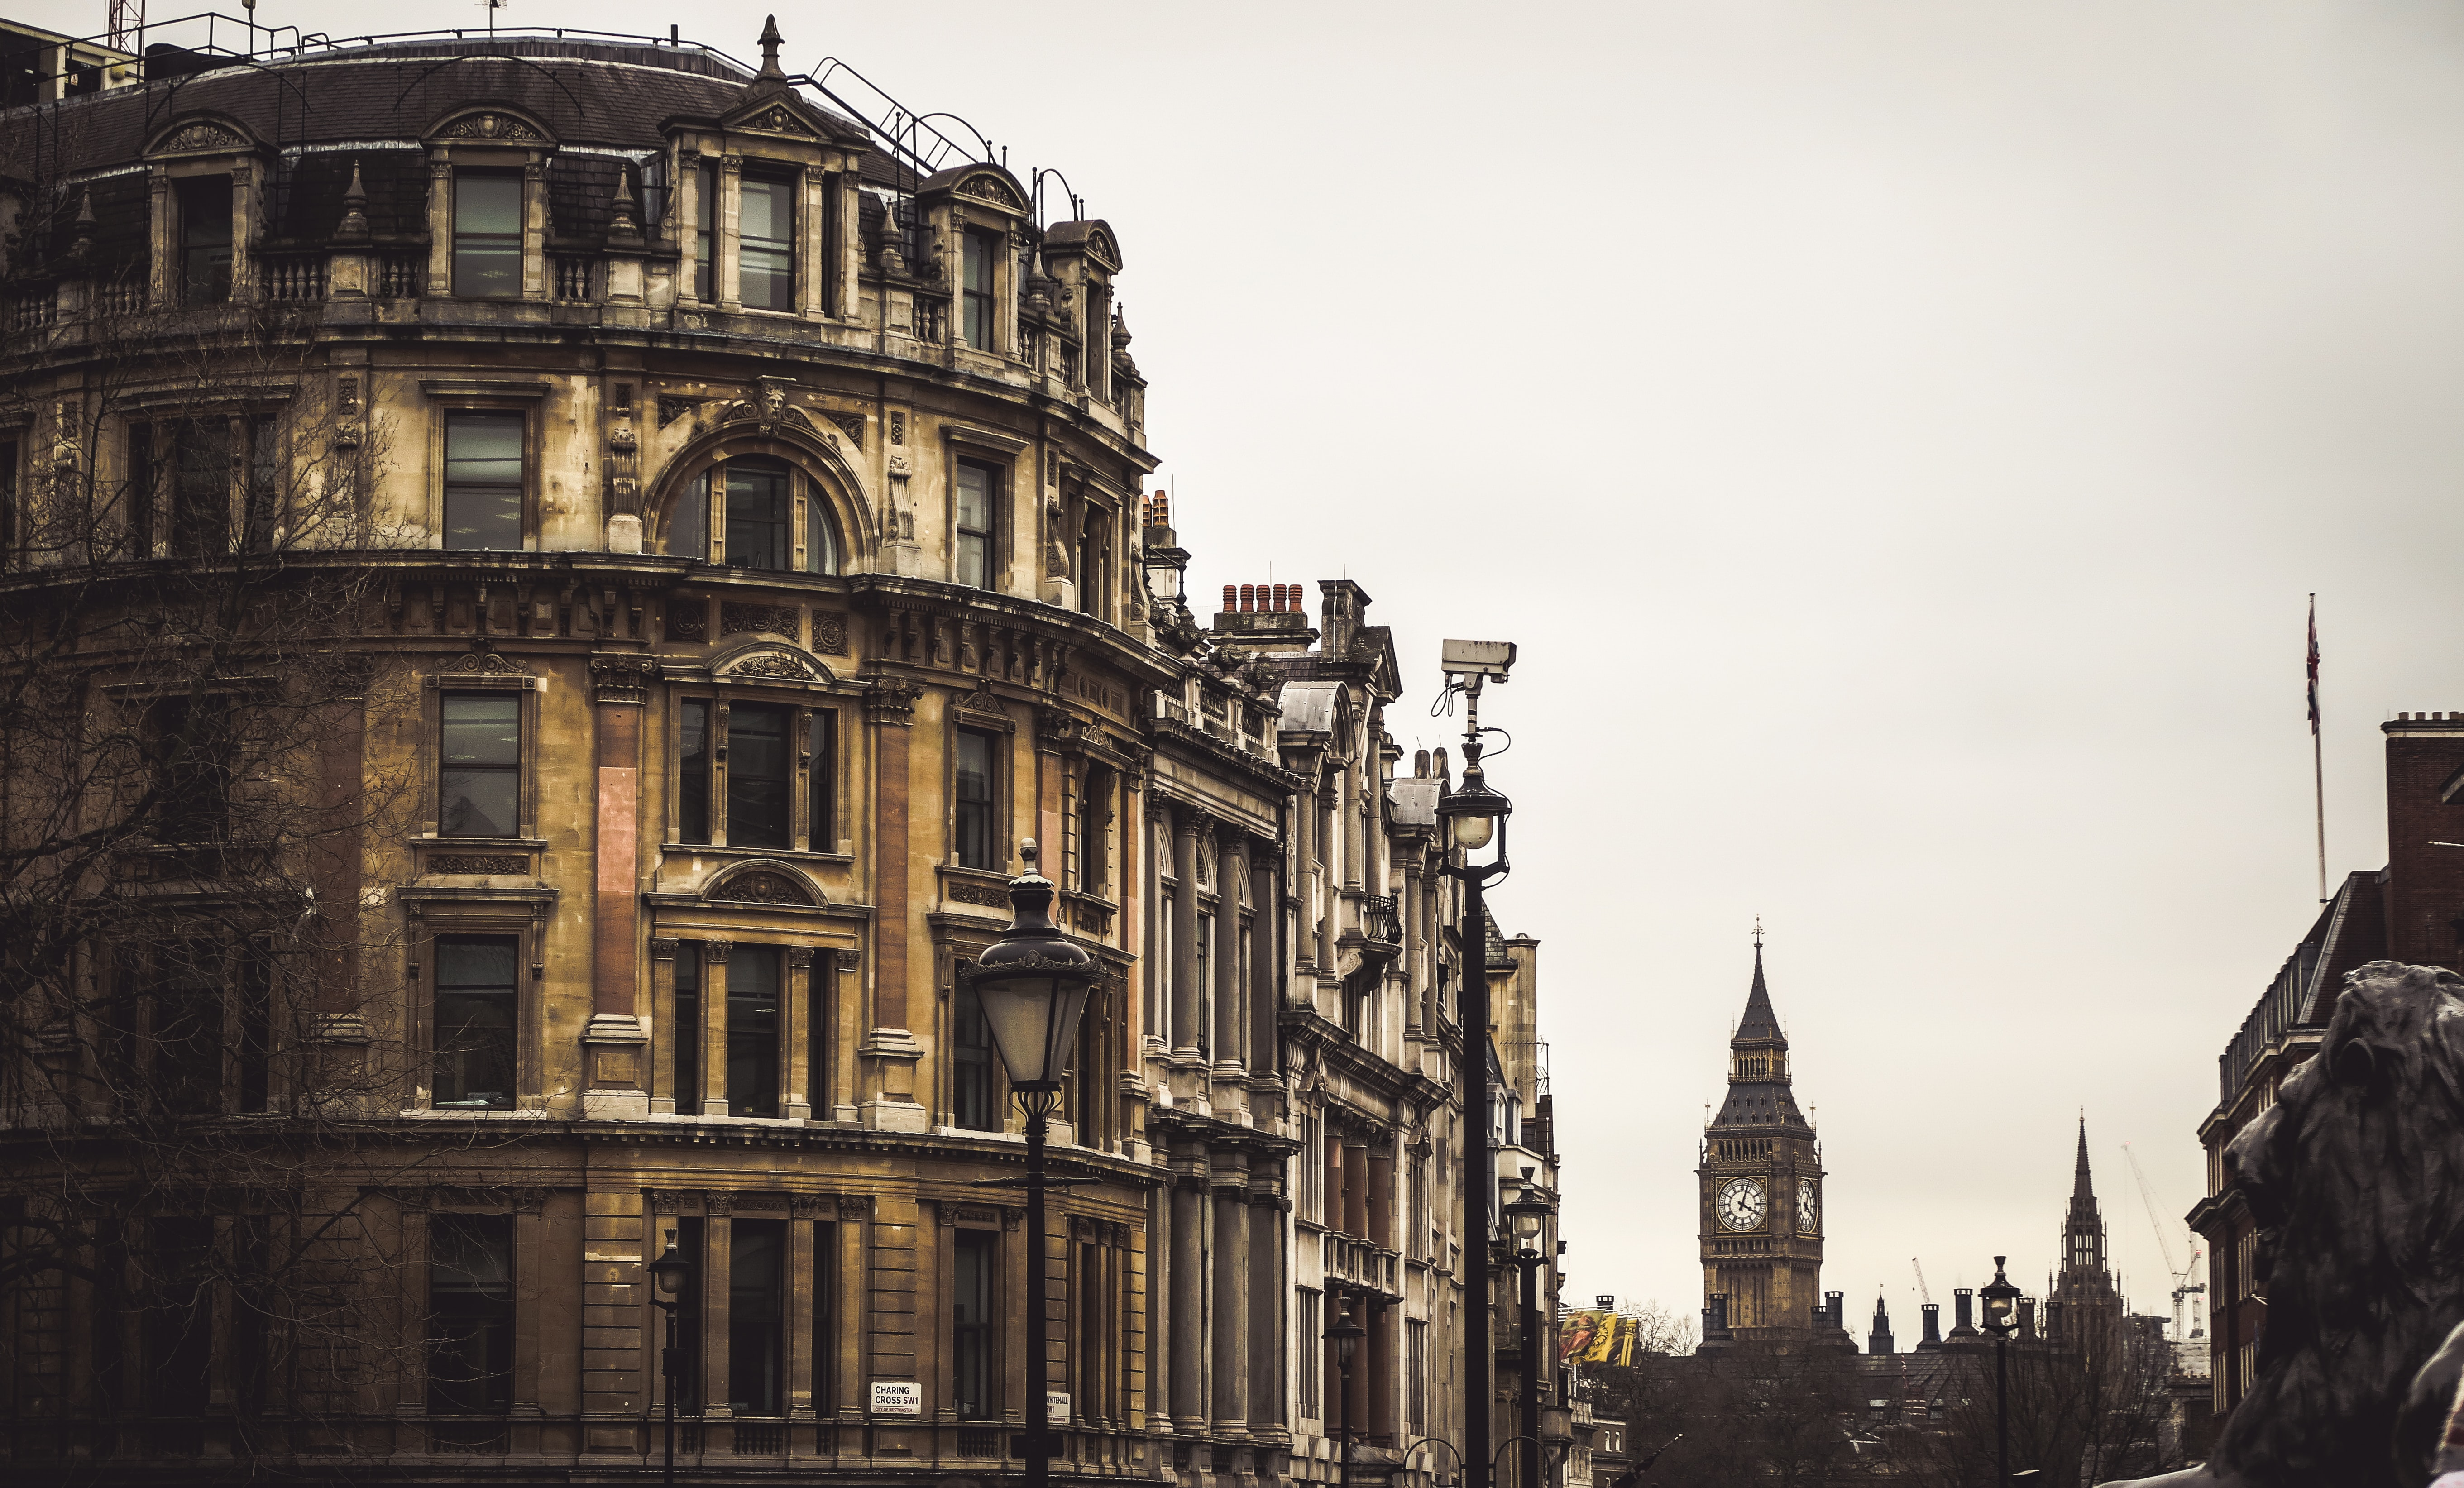 Elizabeth's Tower, London during daytime